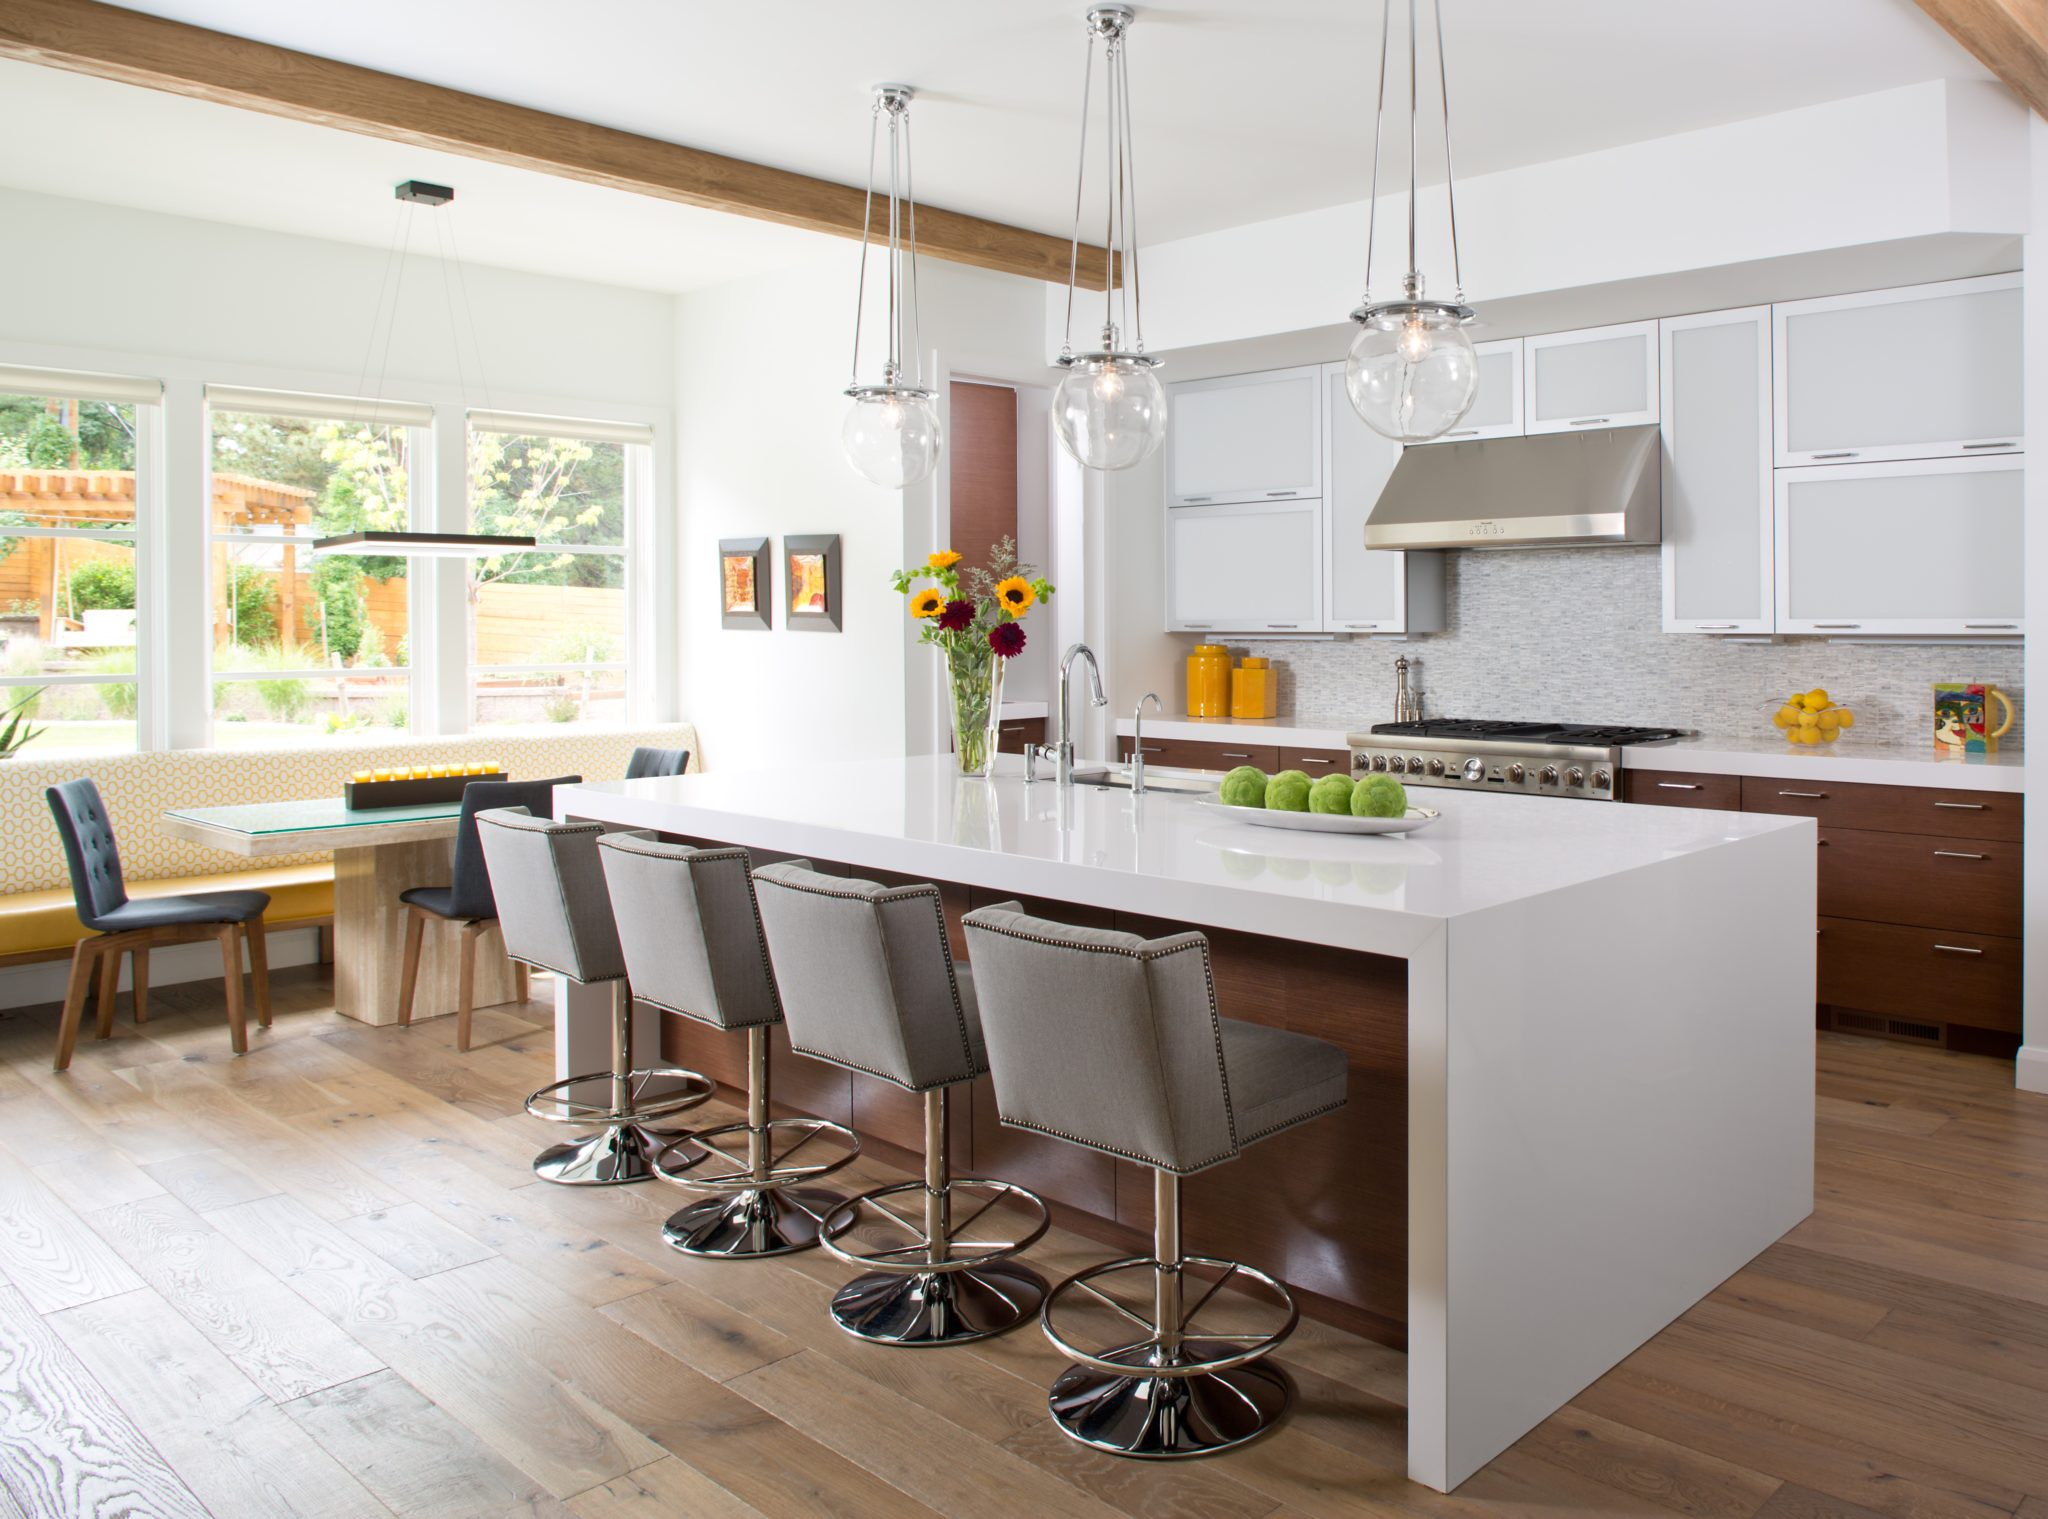 Bonnie Brae - Denver, Colorado, property by Slifer Designs